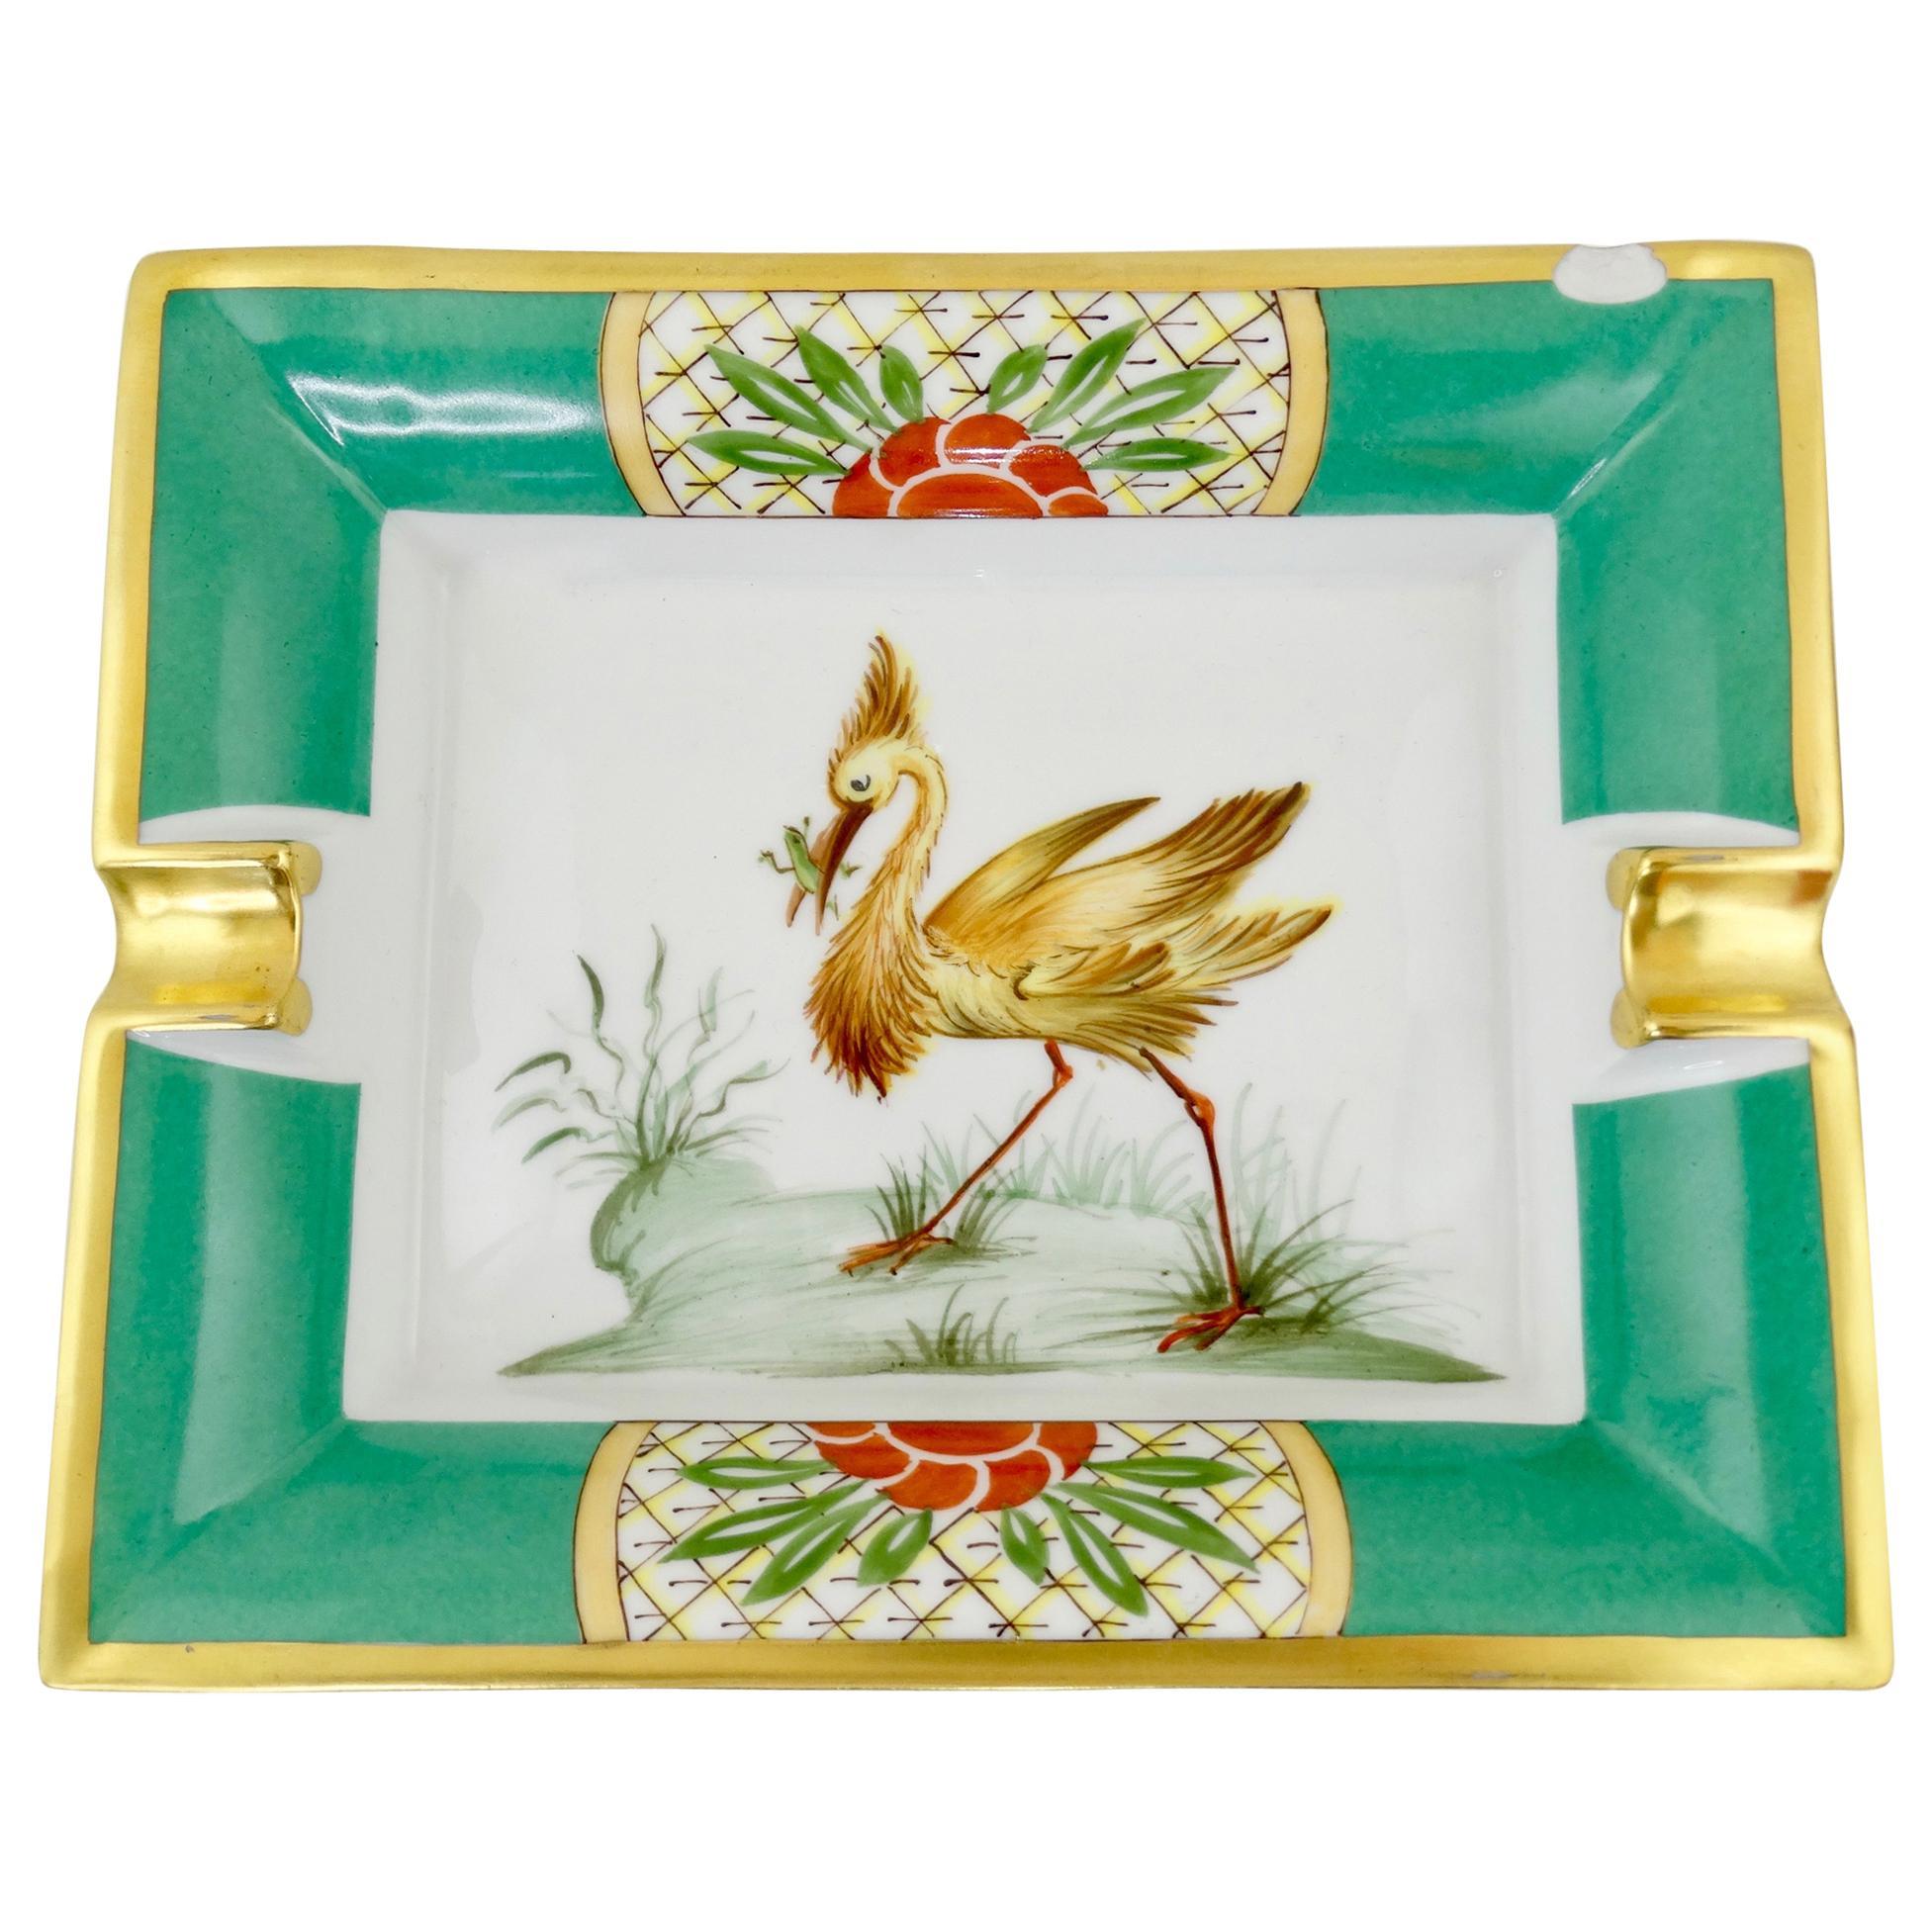 Hermés Late 20th Century Exotic Bird Porcelain Tray